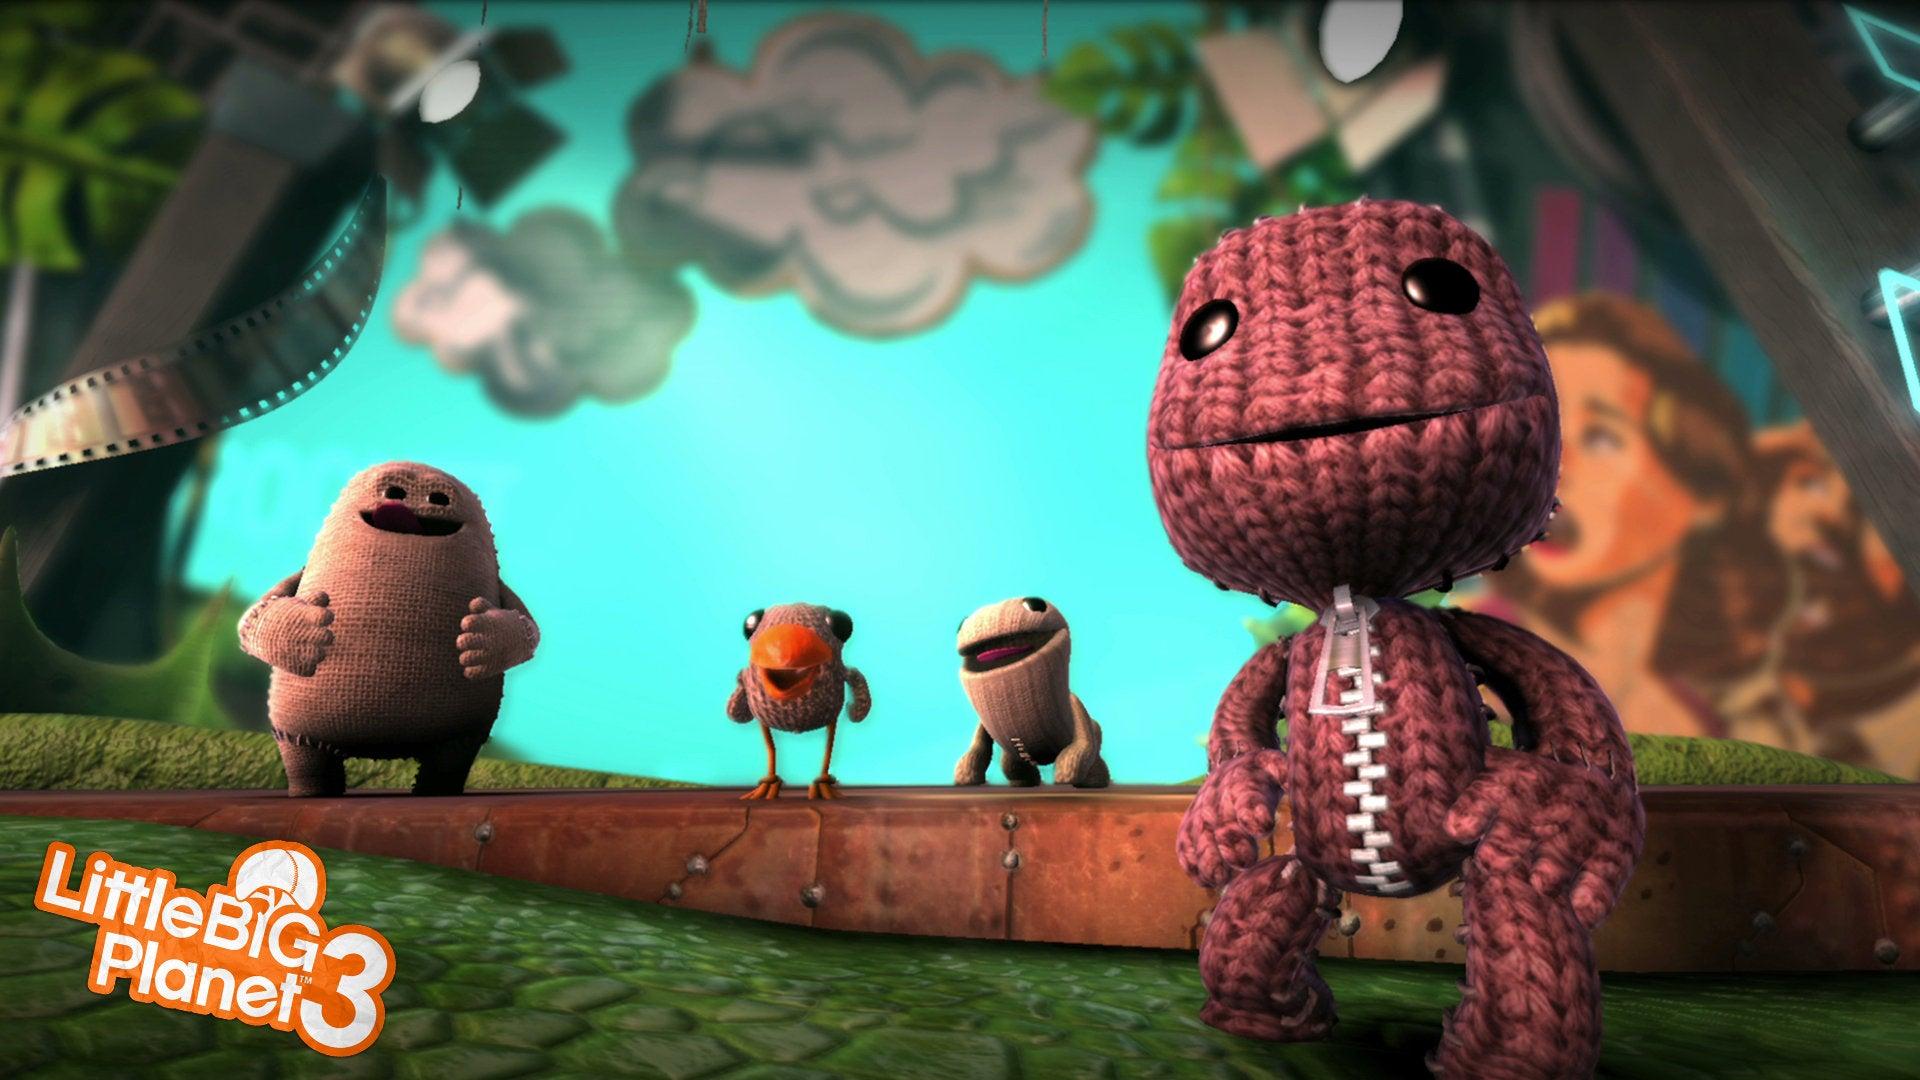 Image for LittleBigPlanet 3: PS4 vs. PS3 comparison video